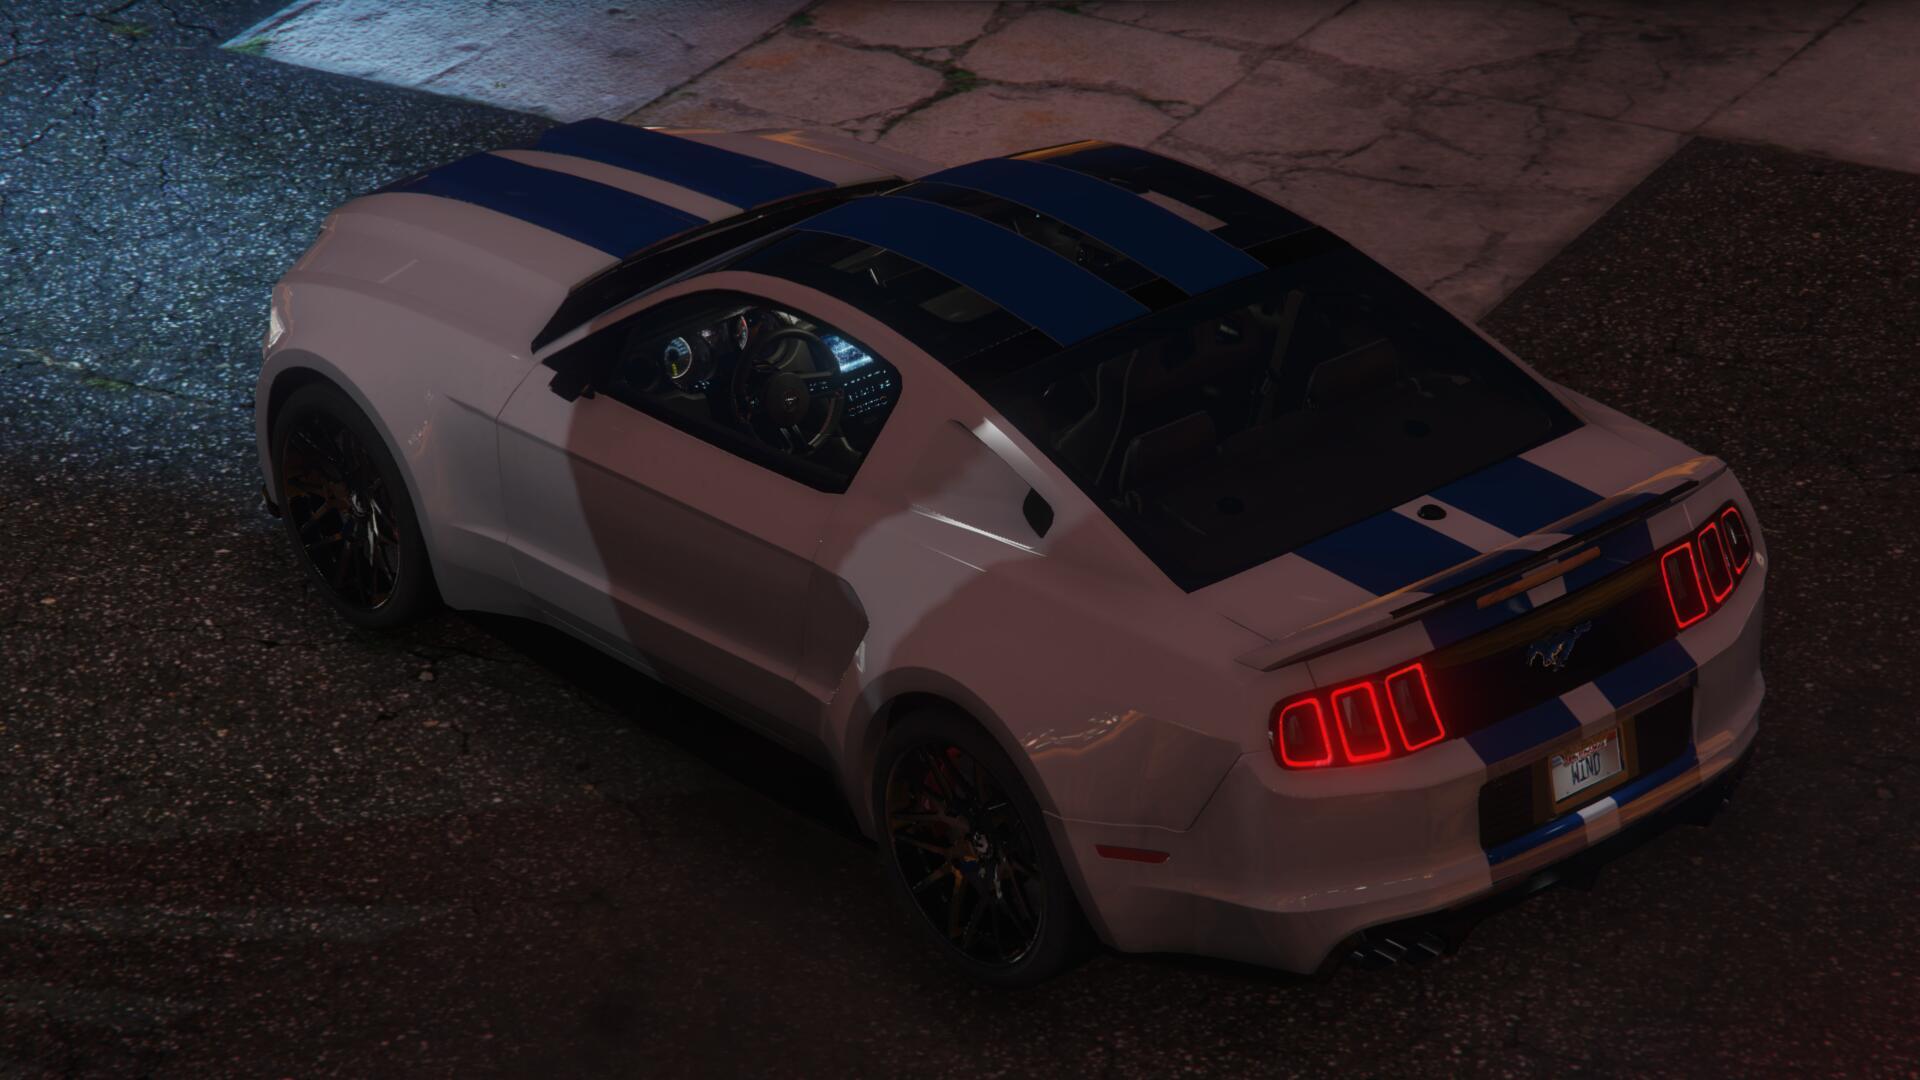 Ford Mustang Gt Nfs Gt500 2013 Add On Gta5 Mods Com